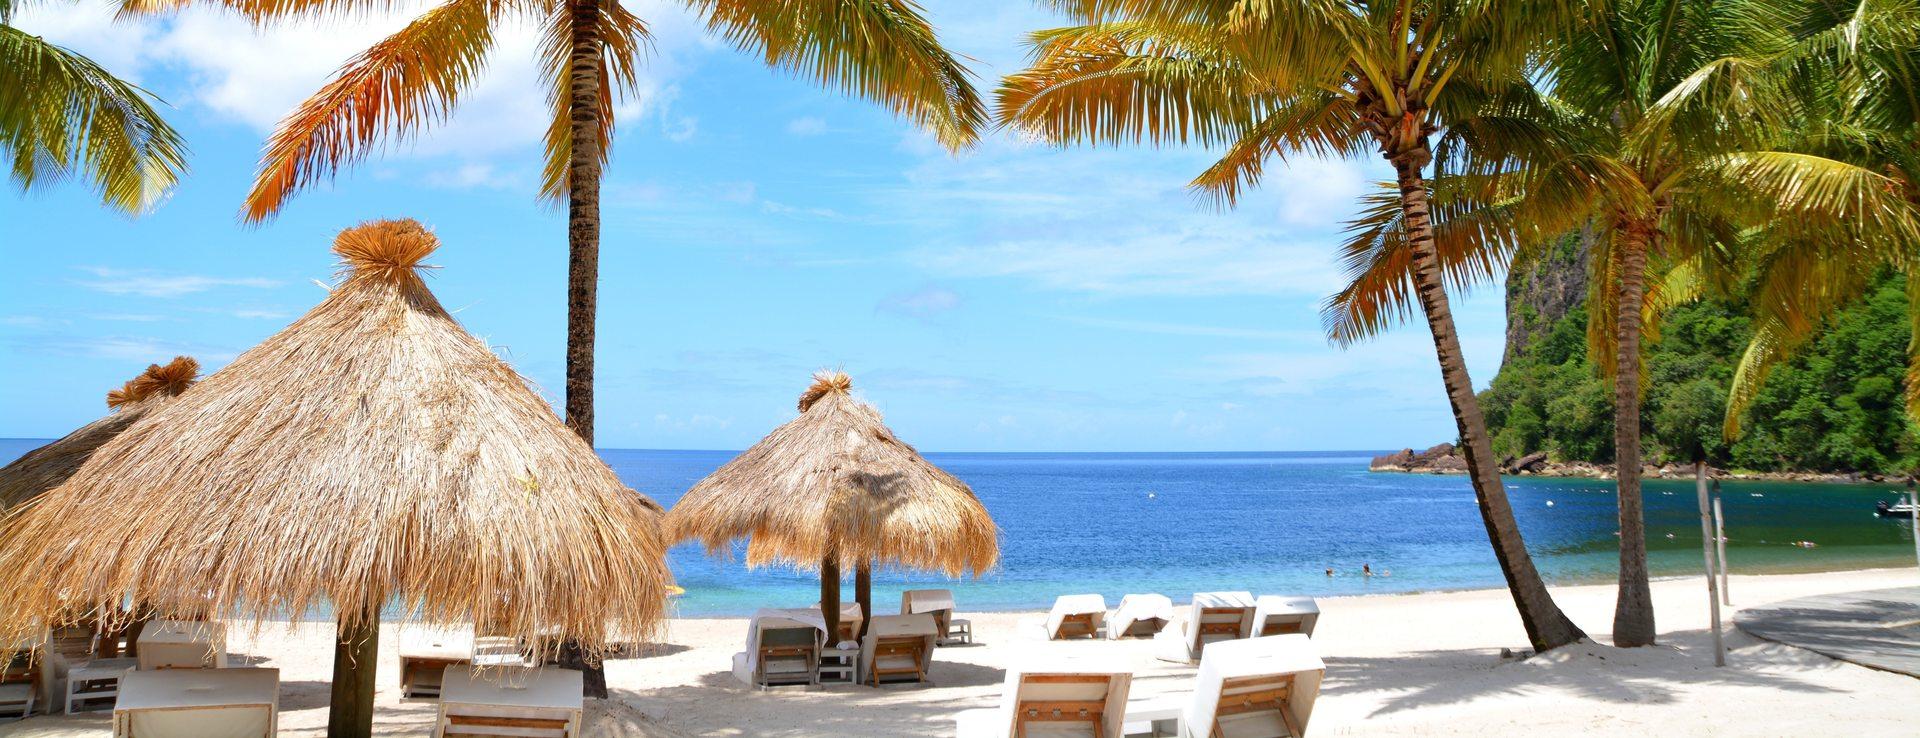 Paradise Beach Nevis Image 1